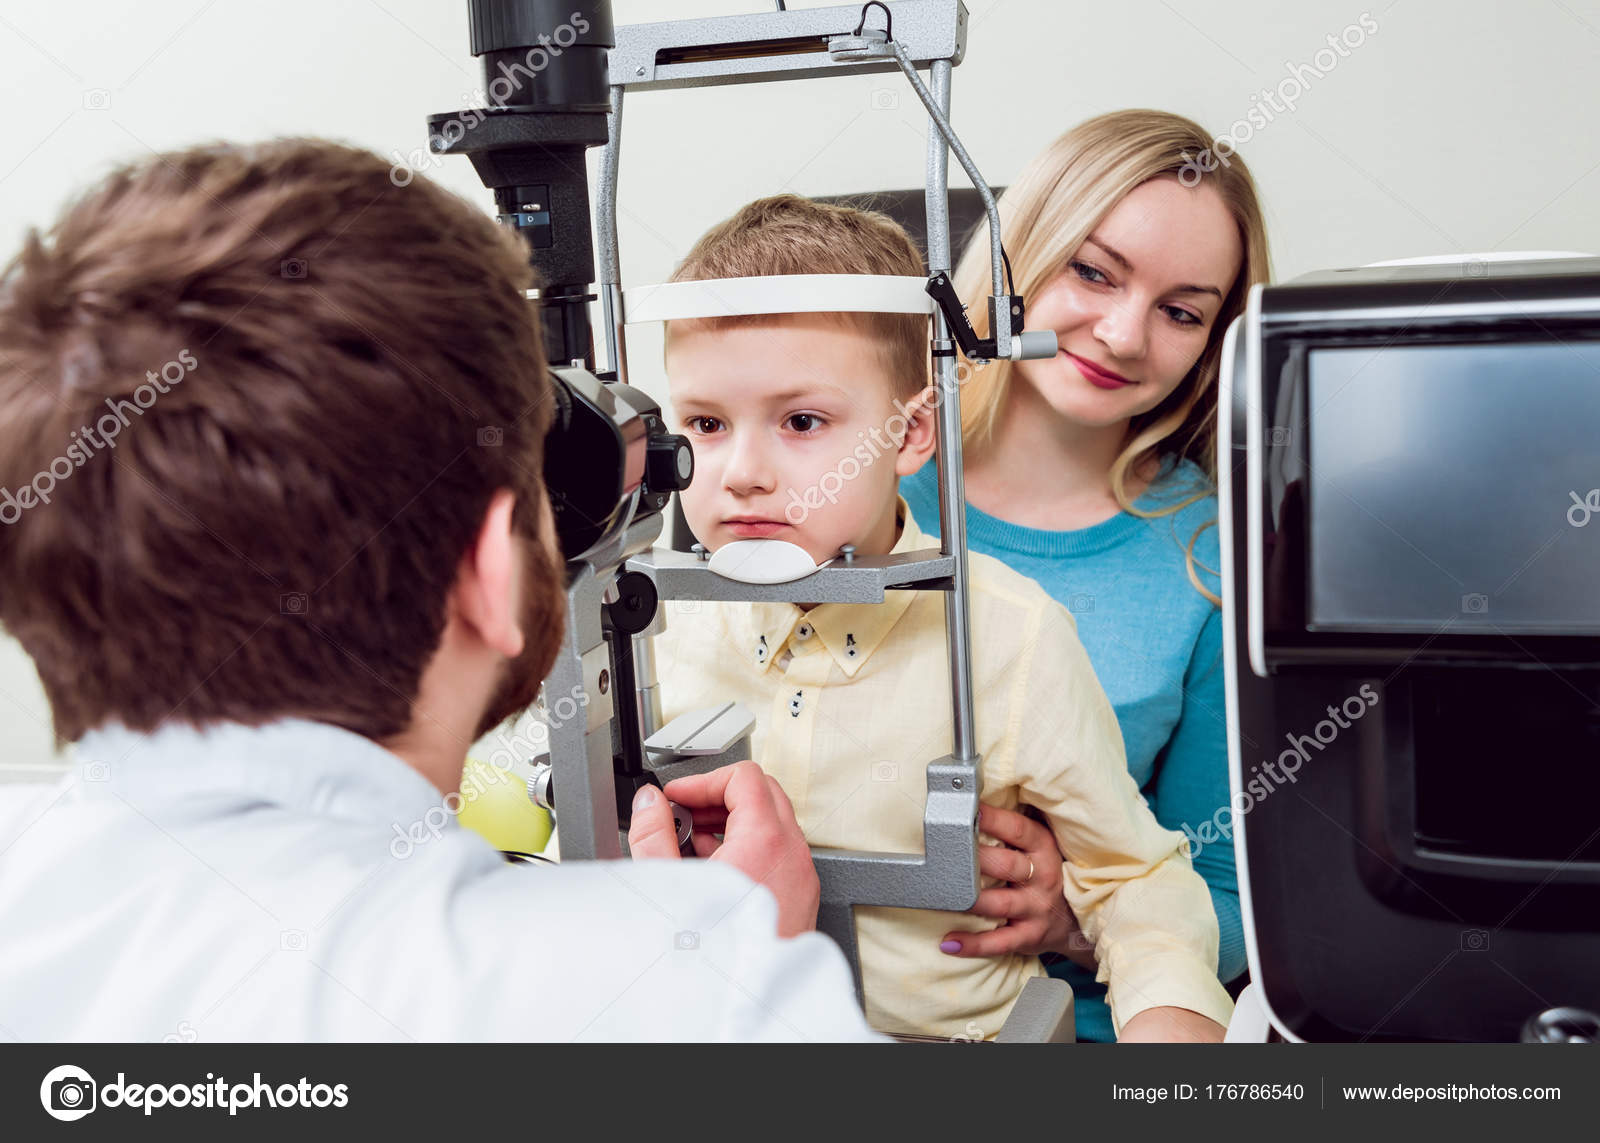 f09e0b2a005 Slit Lamp Examination Biomicroscopy Anterior Eye Segment Basic Eye  Examination — Stock Photo